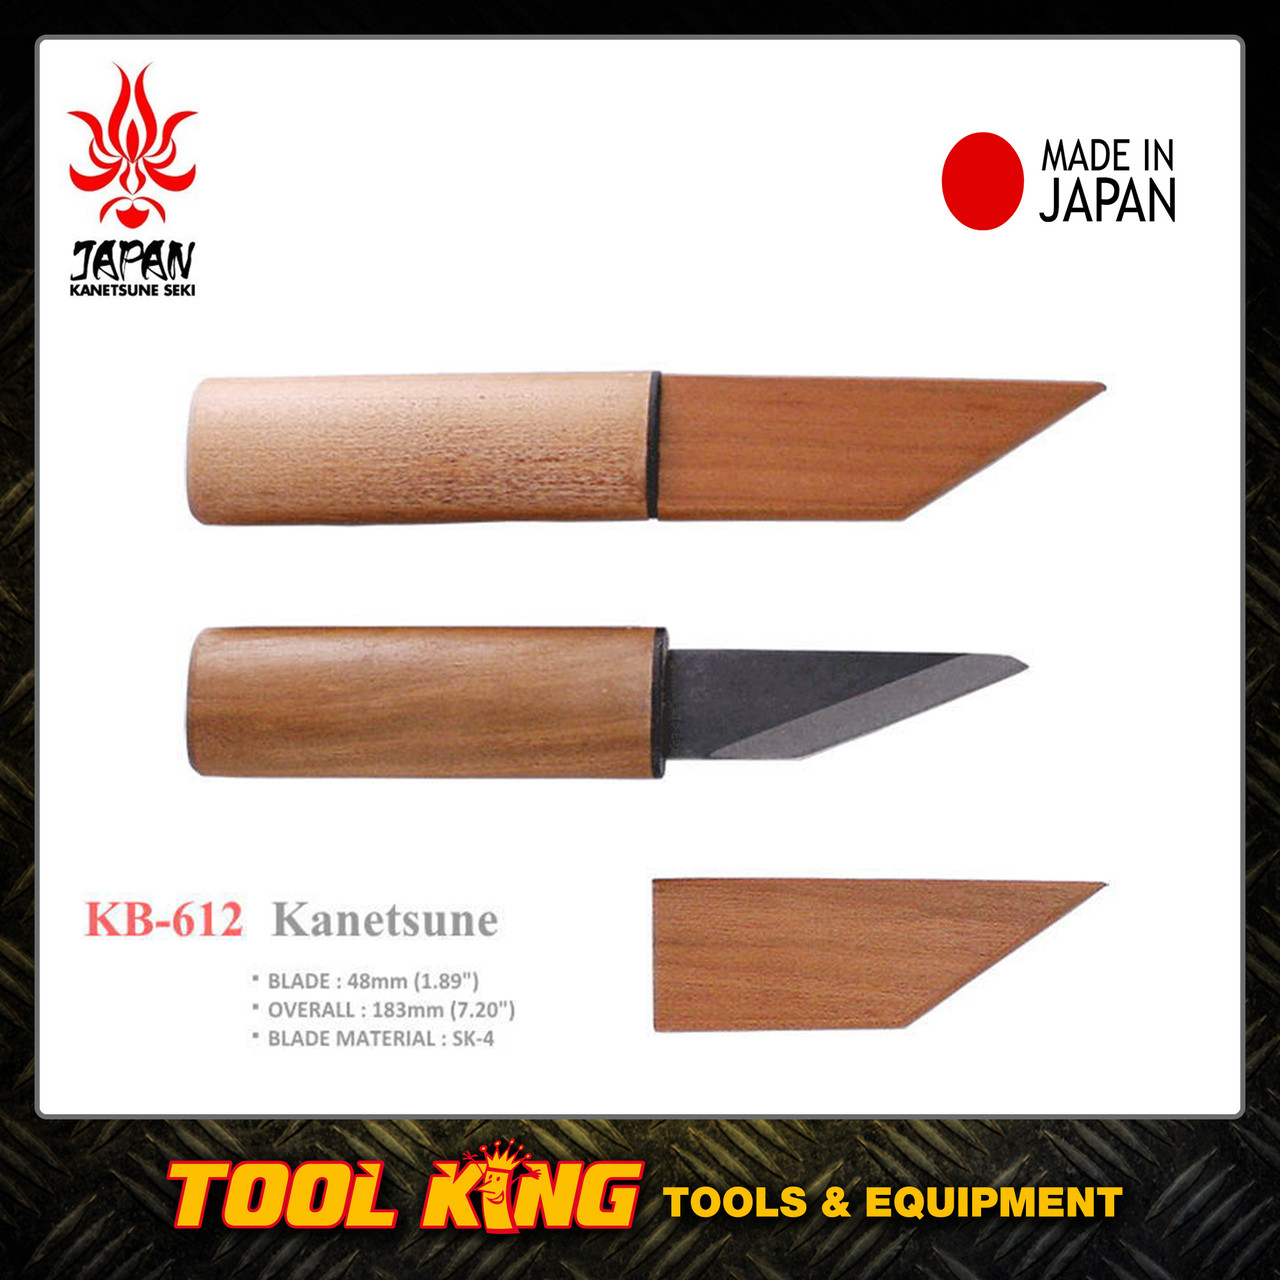 Kiradashi Kanetsune handcrafts knife Made in Japan